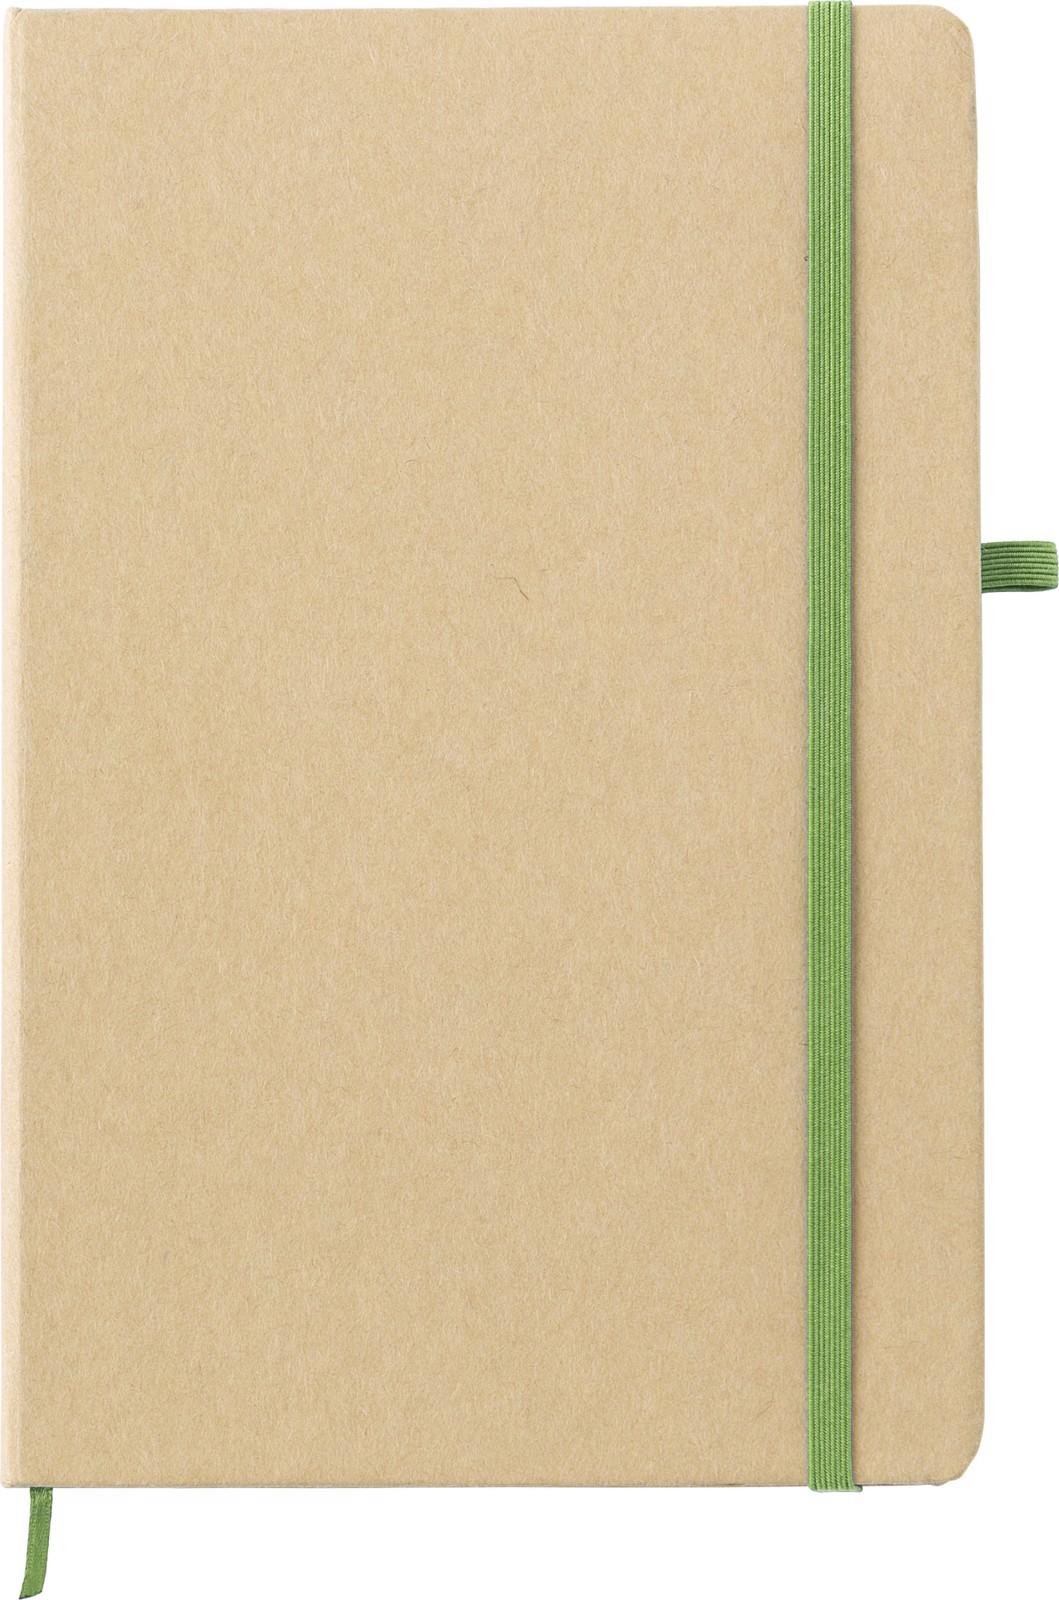 Stonepaper notebook - Green